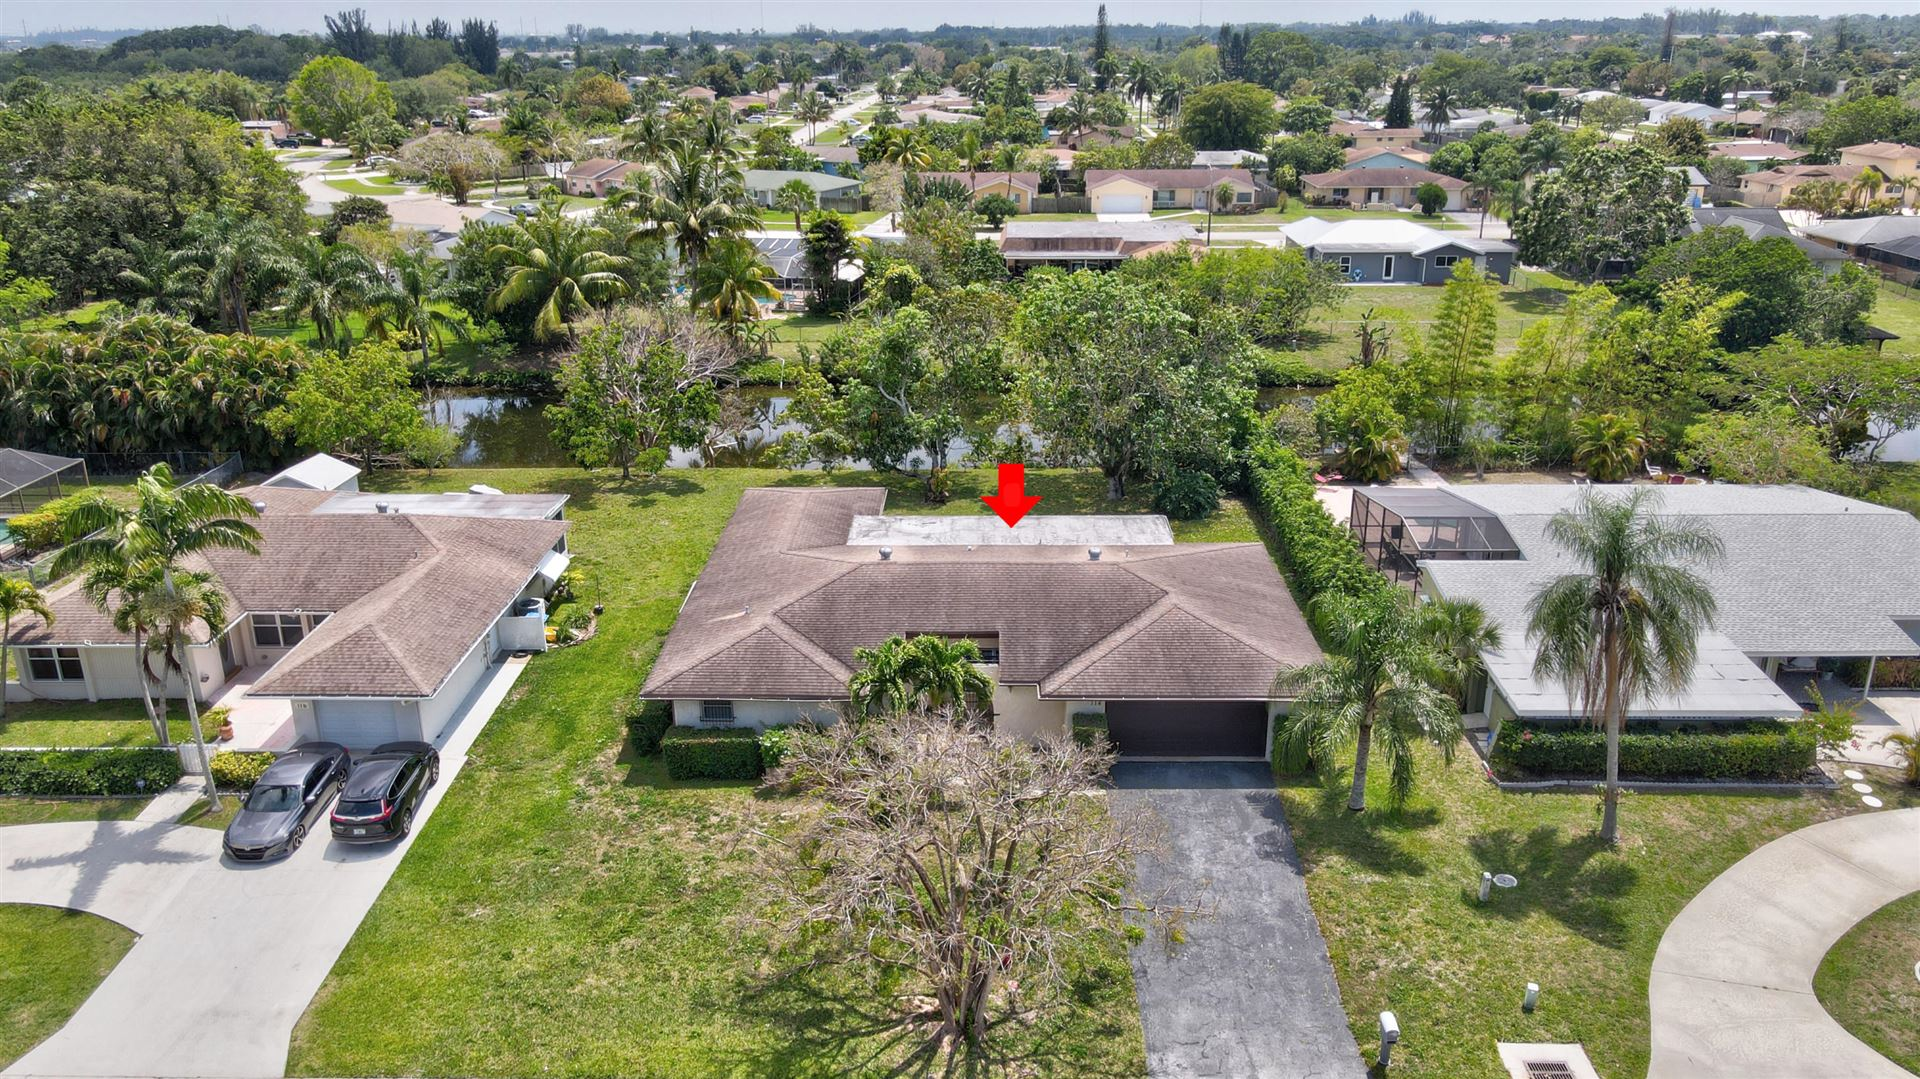 114 Sandpiper Avenue, Royal Palm Beach, FL 33411 - MLS#: RX-10711520